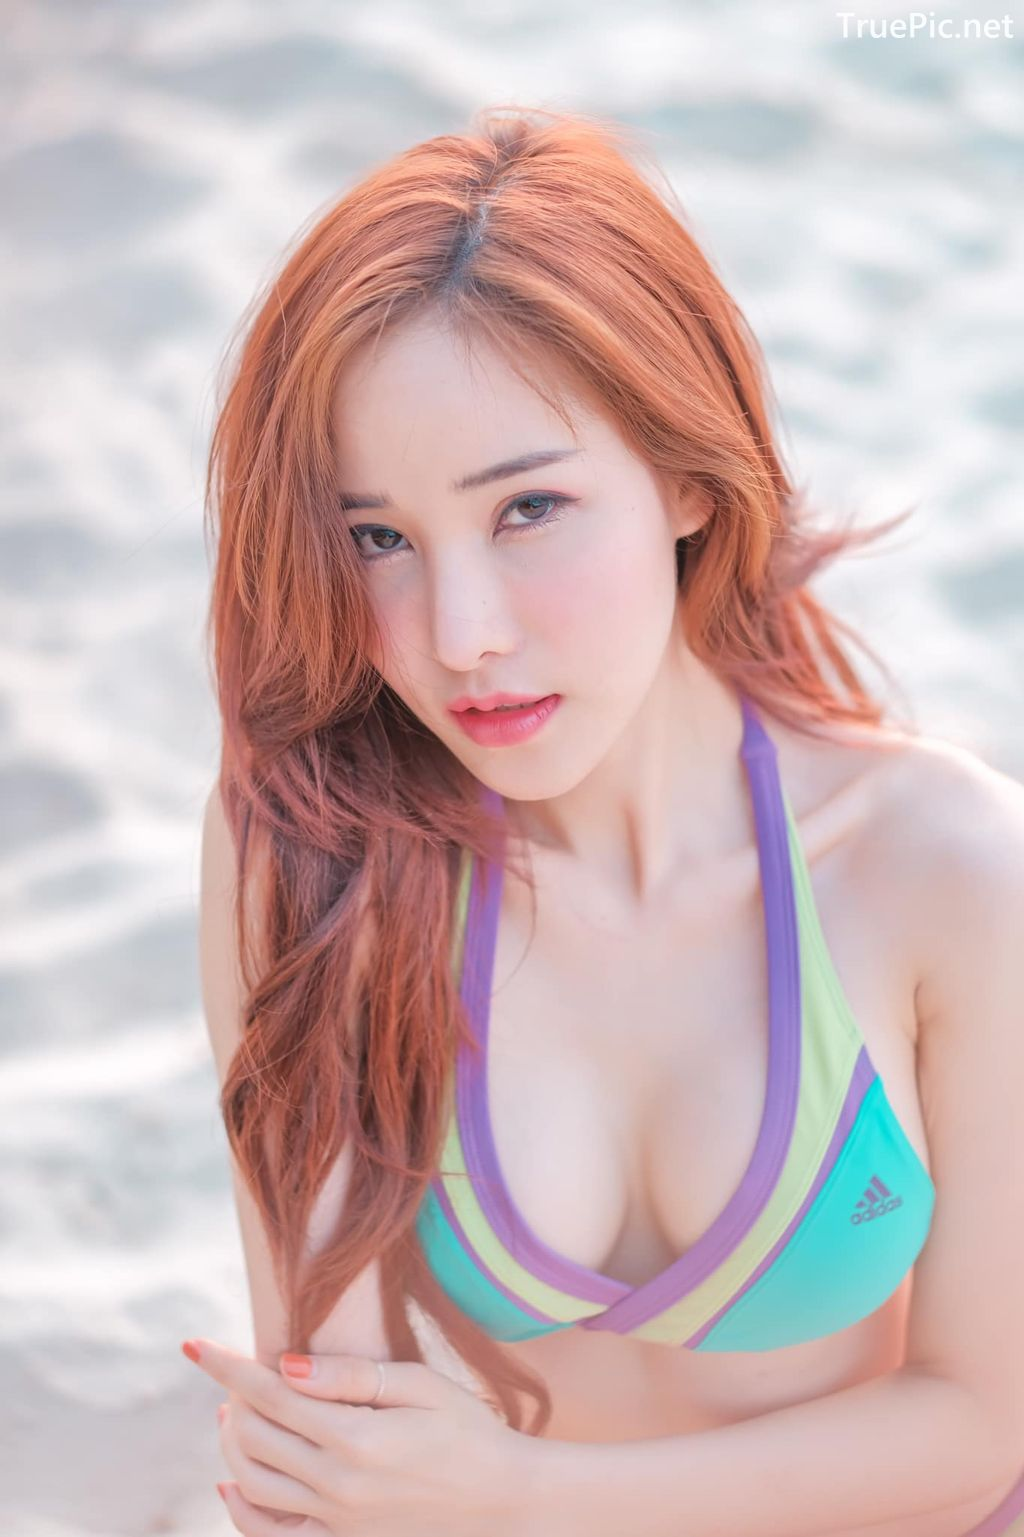 Image-Thailand-Model-Arys-Nam-in-Arysiacara-Summer-Time-Sweet-Bikini-TruePic.net- Picture-1